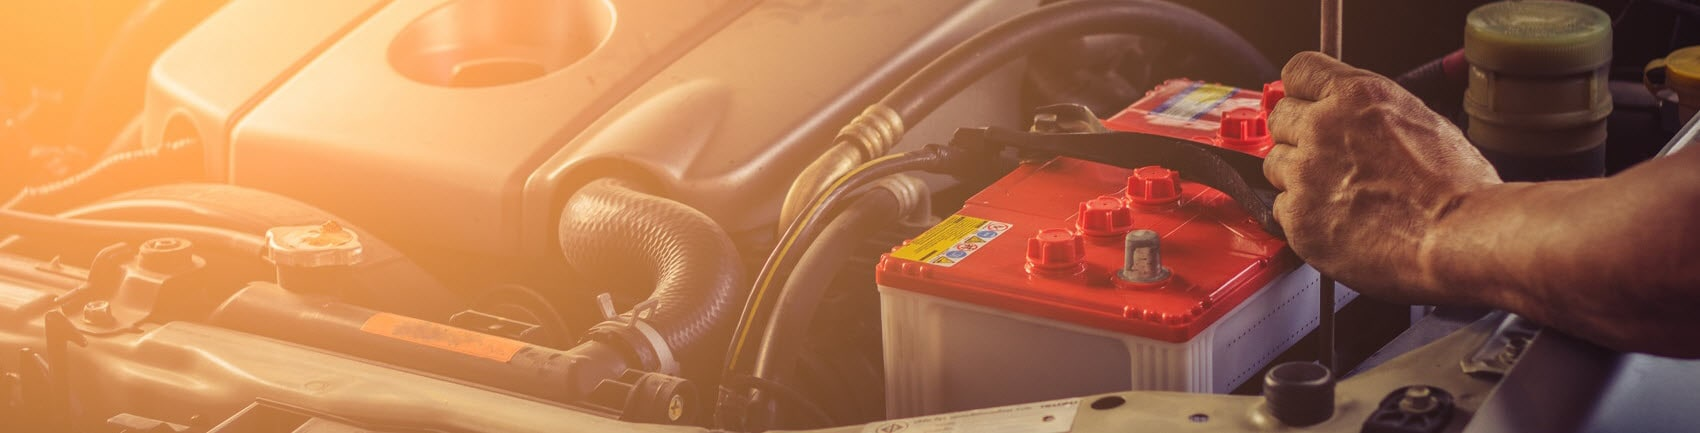 How Long Does Car Battery Last >> How Long Does A Car Battery Last Audi West Palm Beach Fl